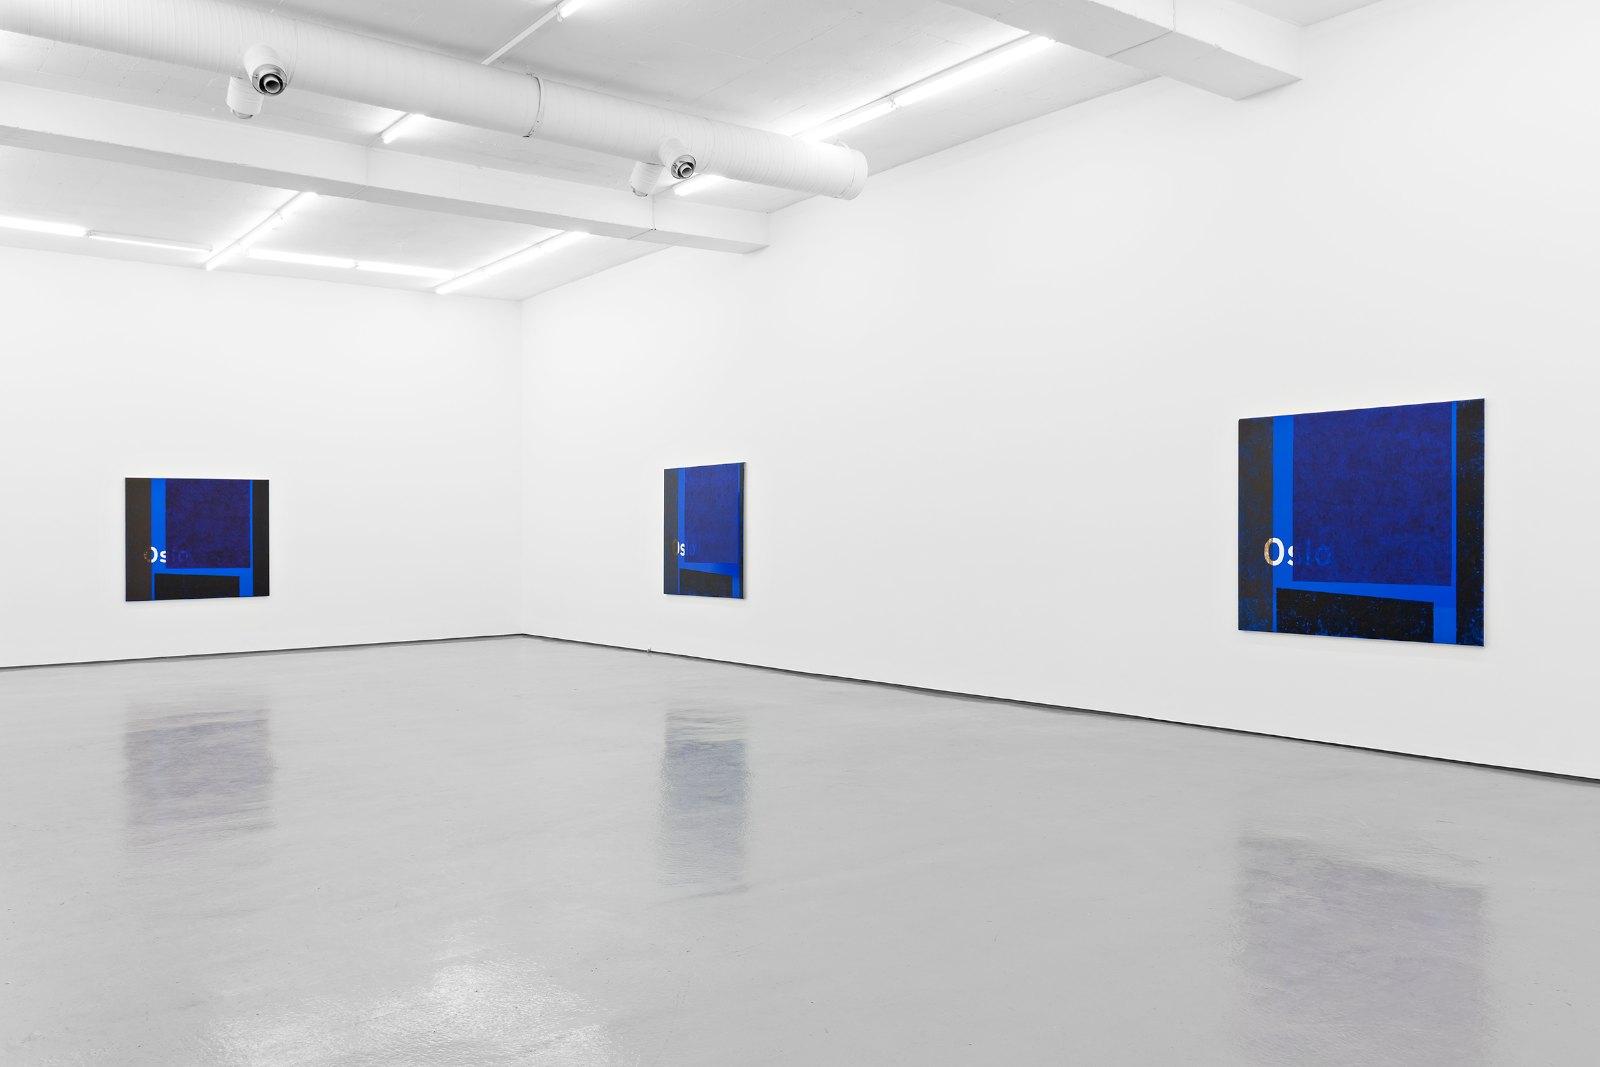 Installation view Sverre Wyller, Oslo, Galleri Riis, Oslo, 2014